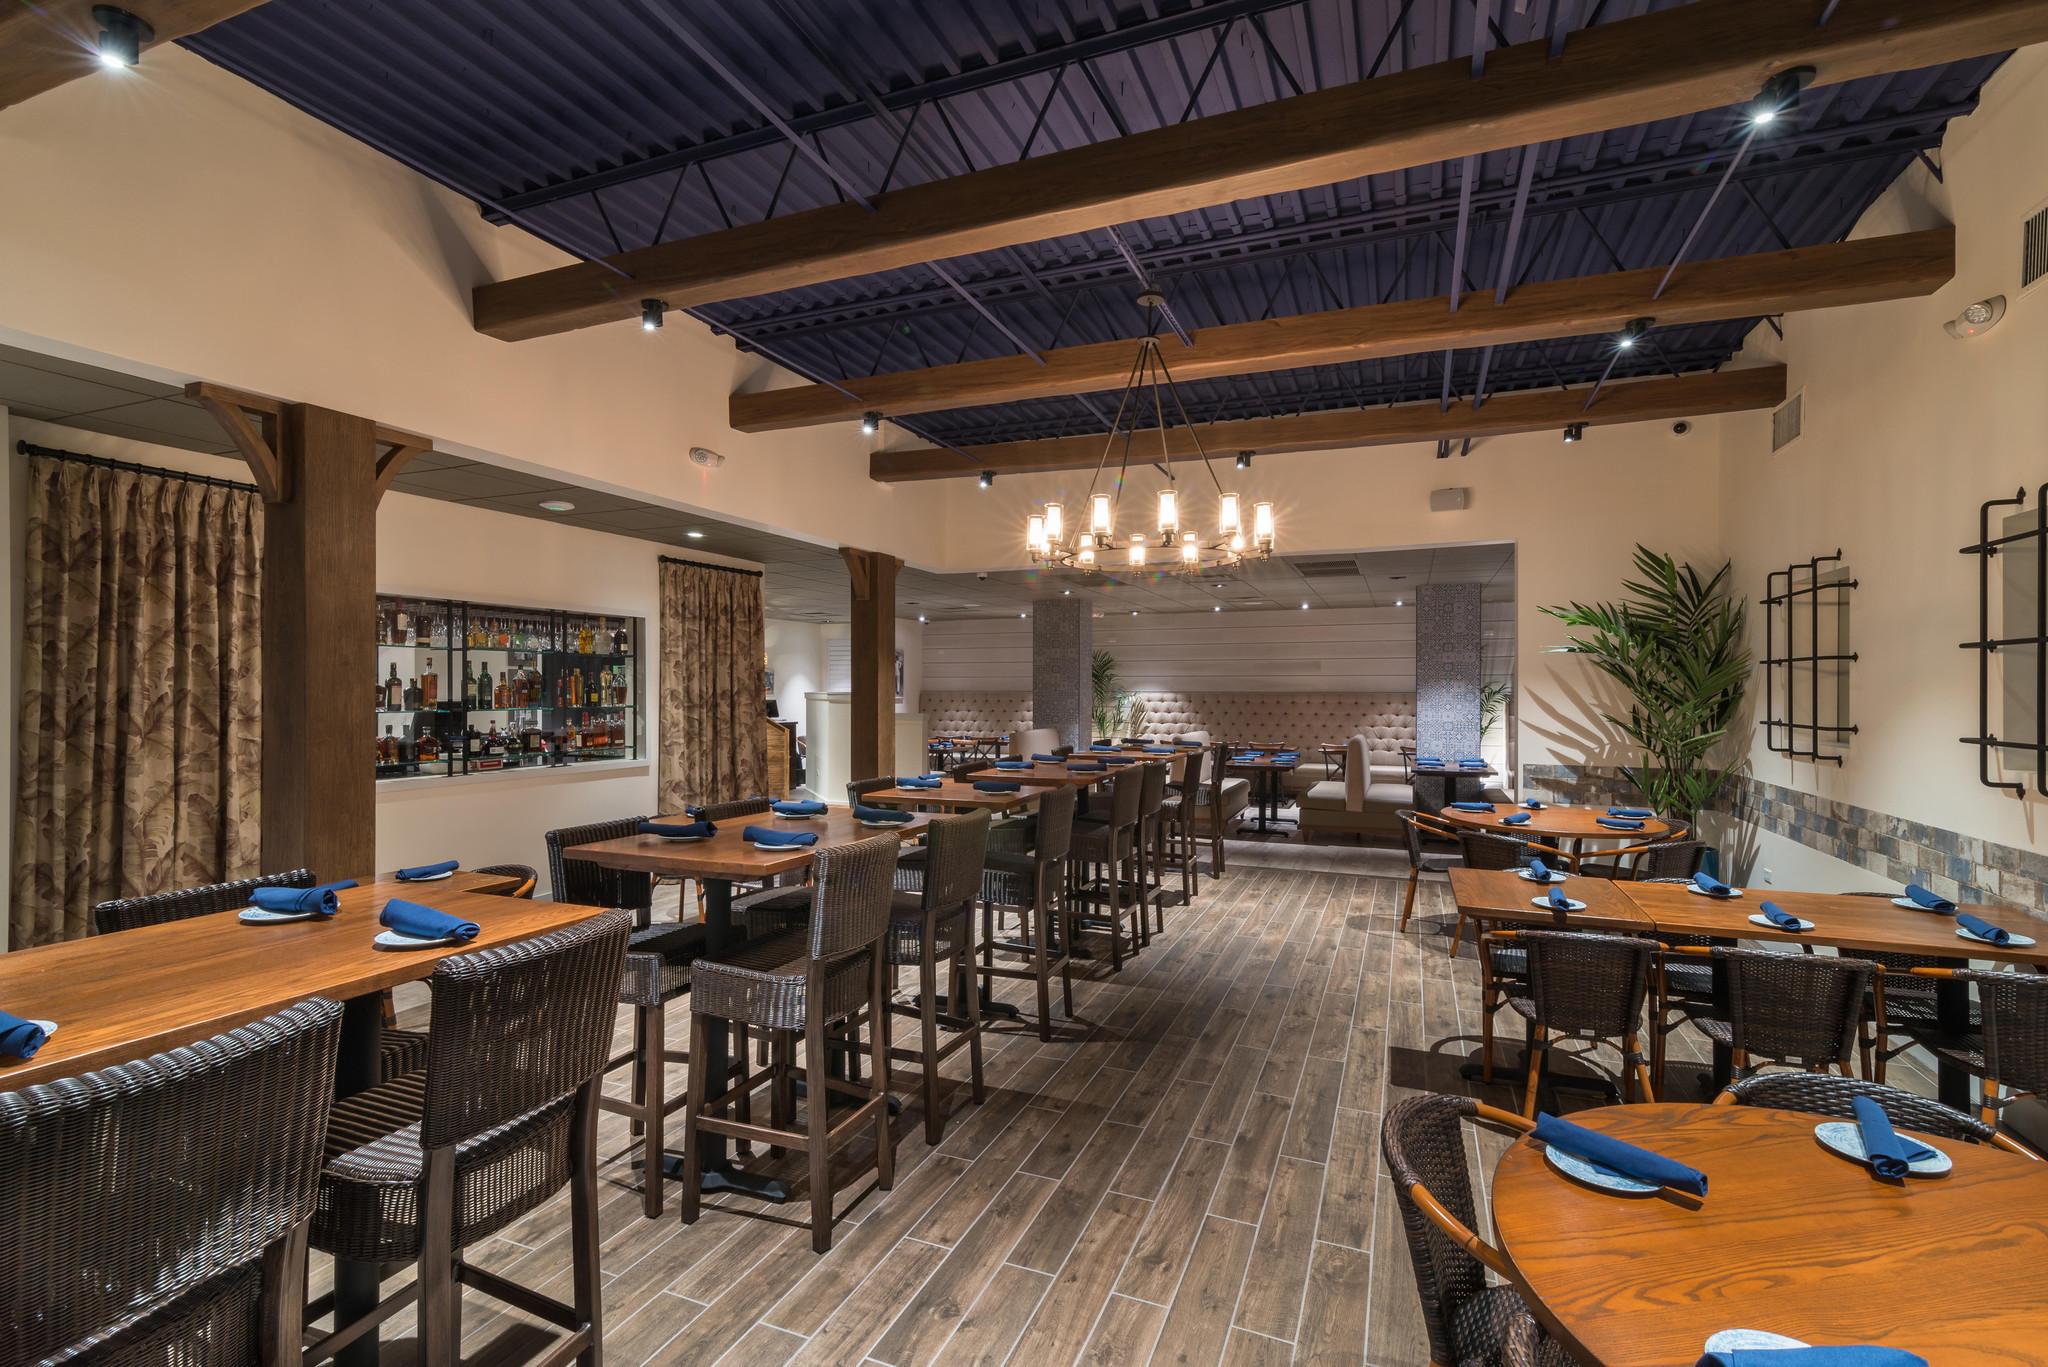 Padrino S Cuban Cuisine Opens Fifth Location In Fort Lauderdale Sun Sentinel